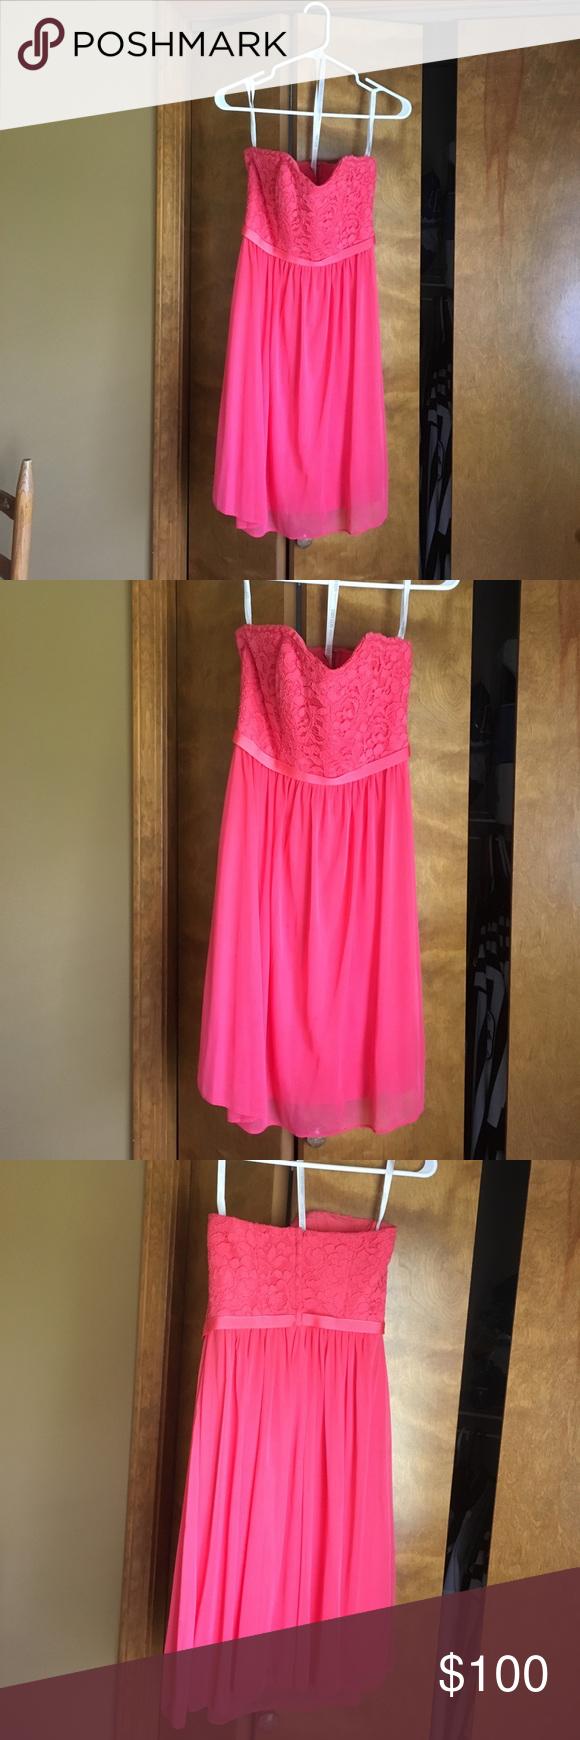 David\'s Bridal Bridesmaid dress - accepting offers